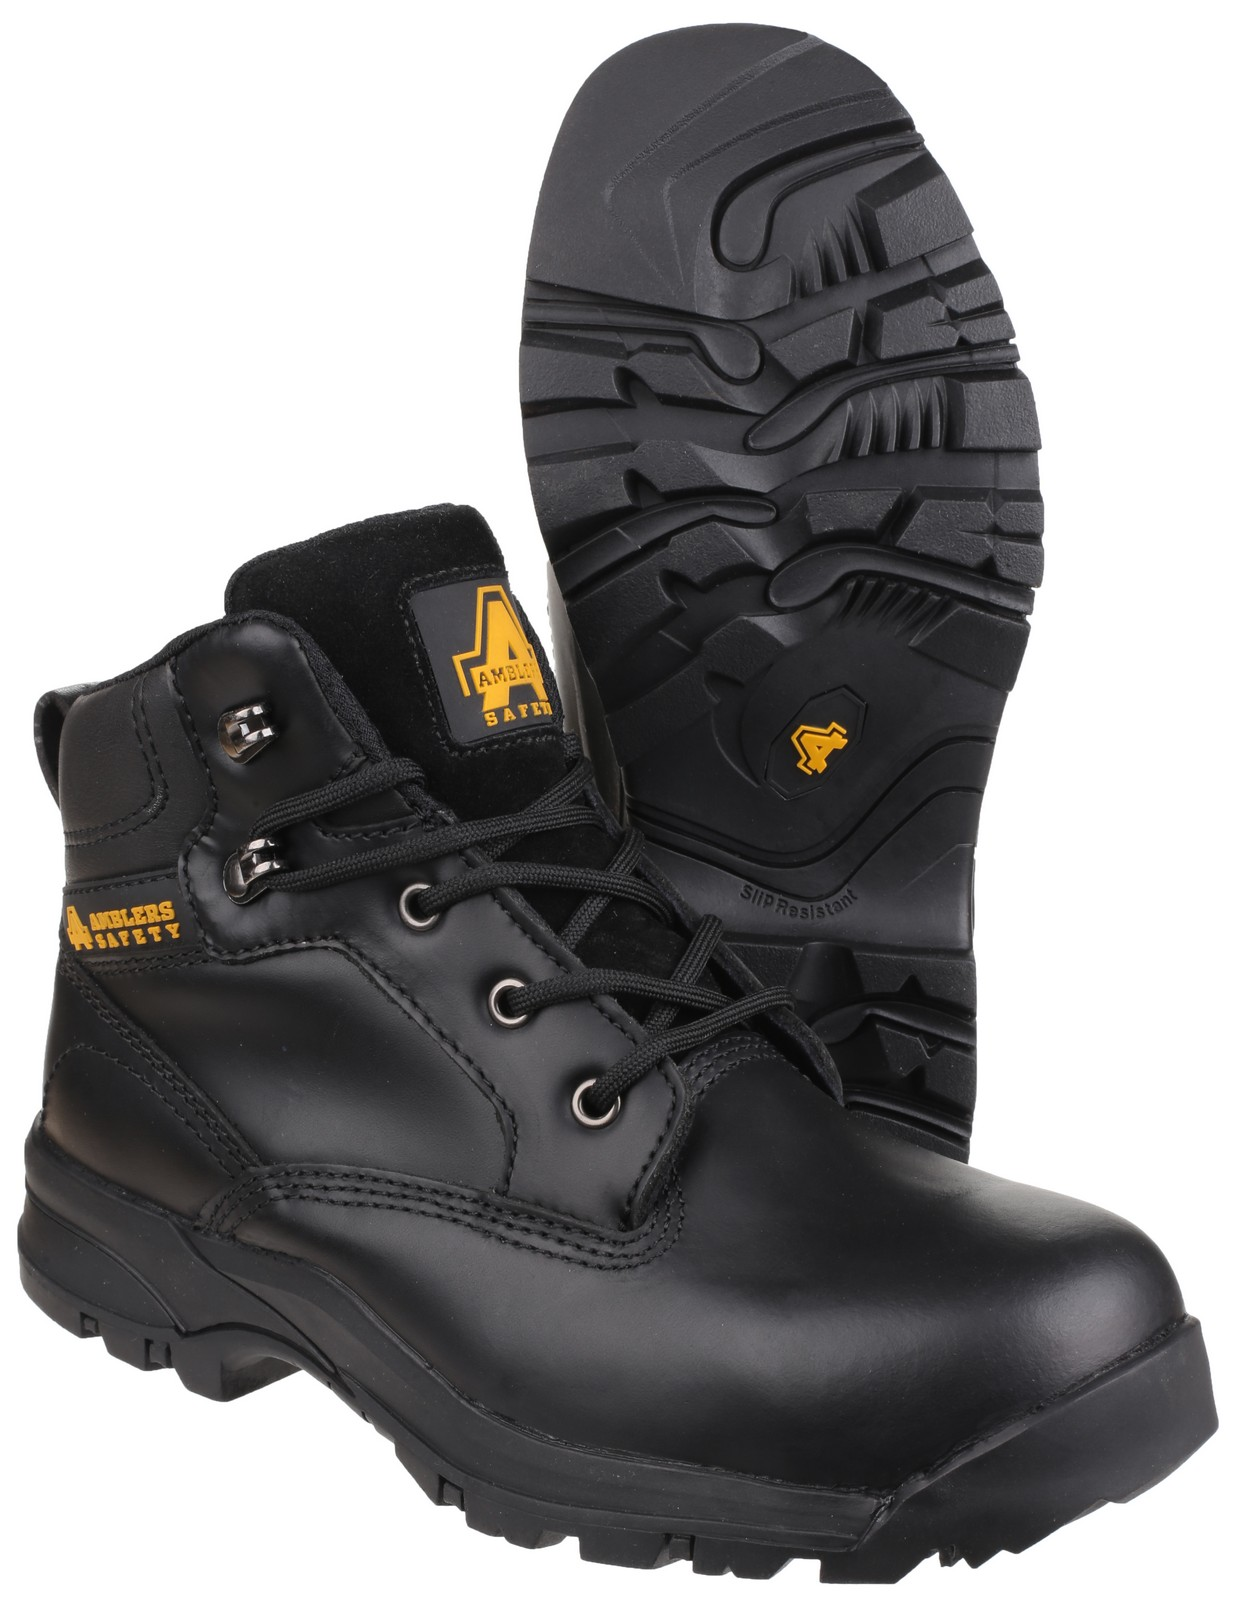 Precios Amblers Steel Lace-Up Textile Lined Womens Boots - Black - Size 5 Suministro de venta YeGUrGOBqo